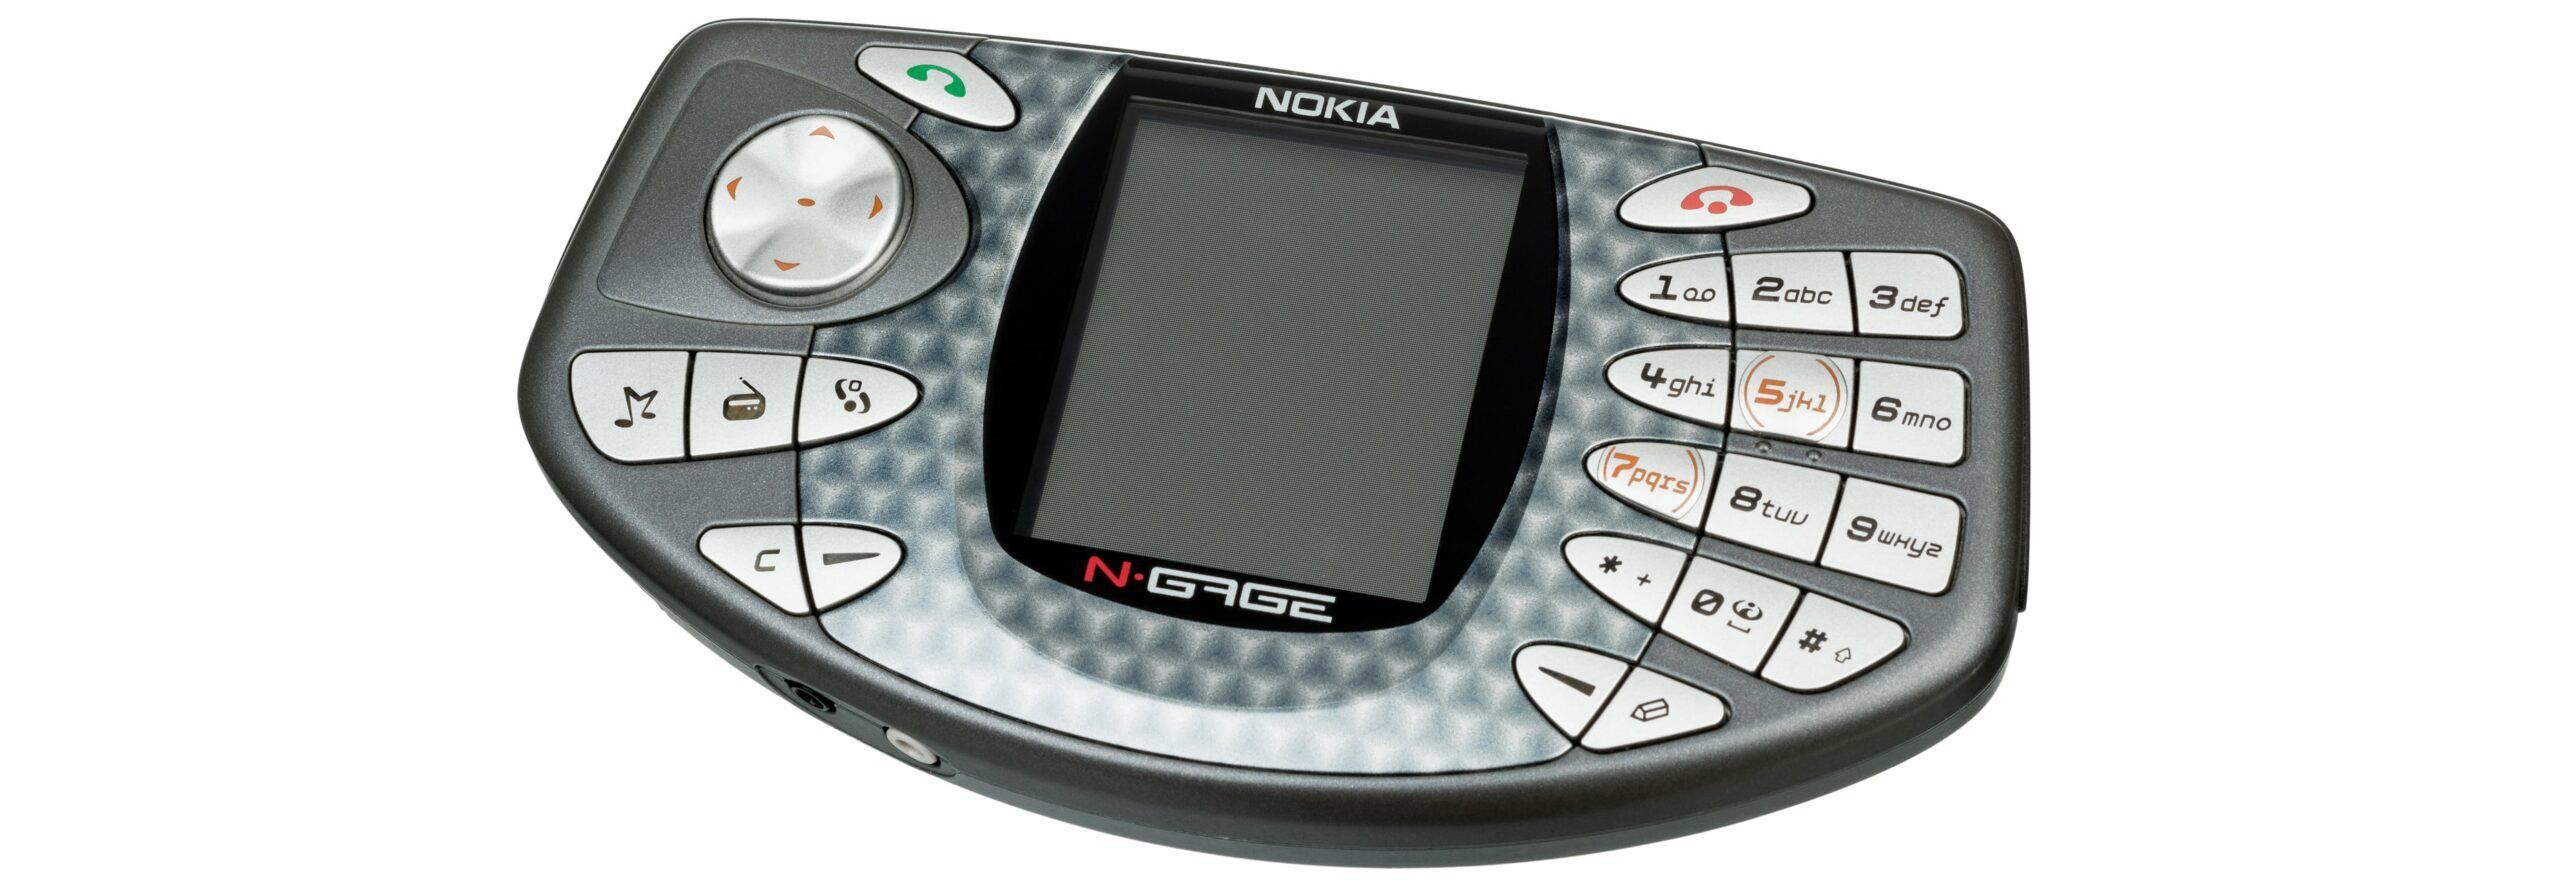 Nokia N-Gage phone/gaming combo